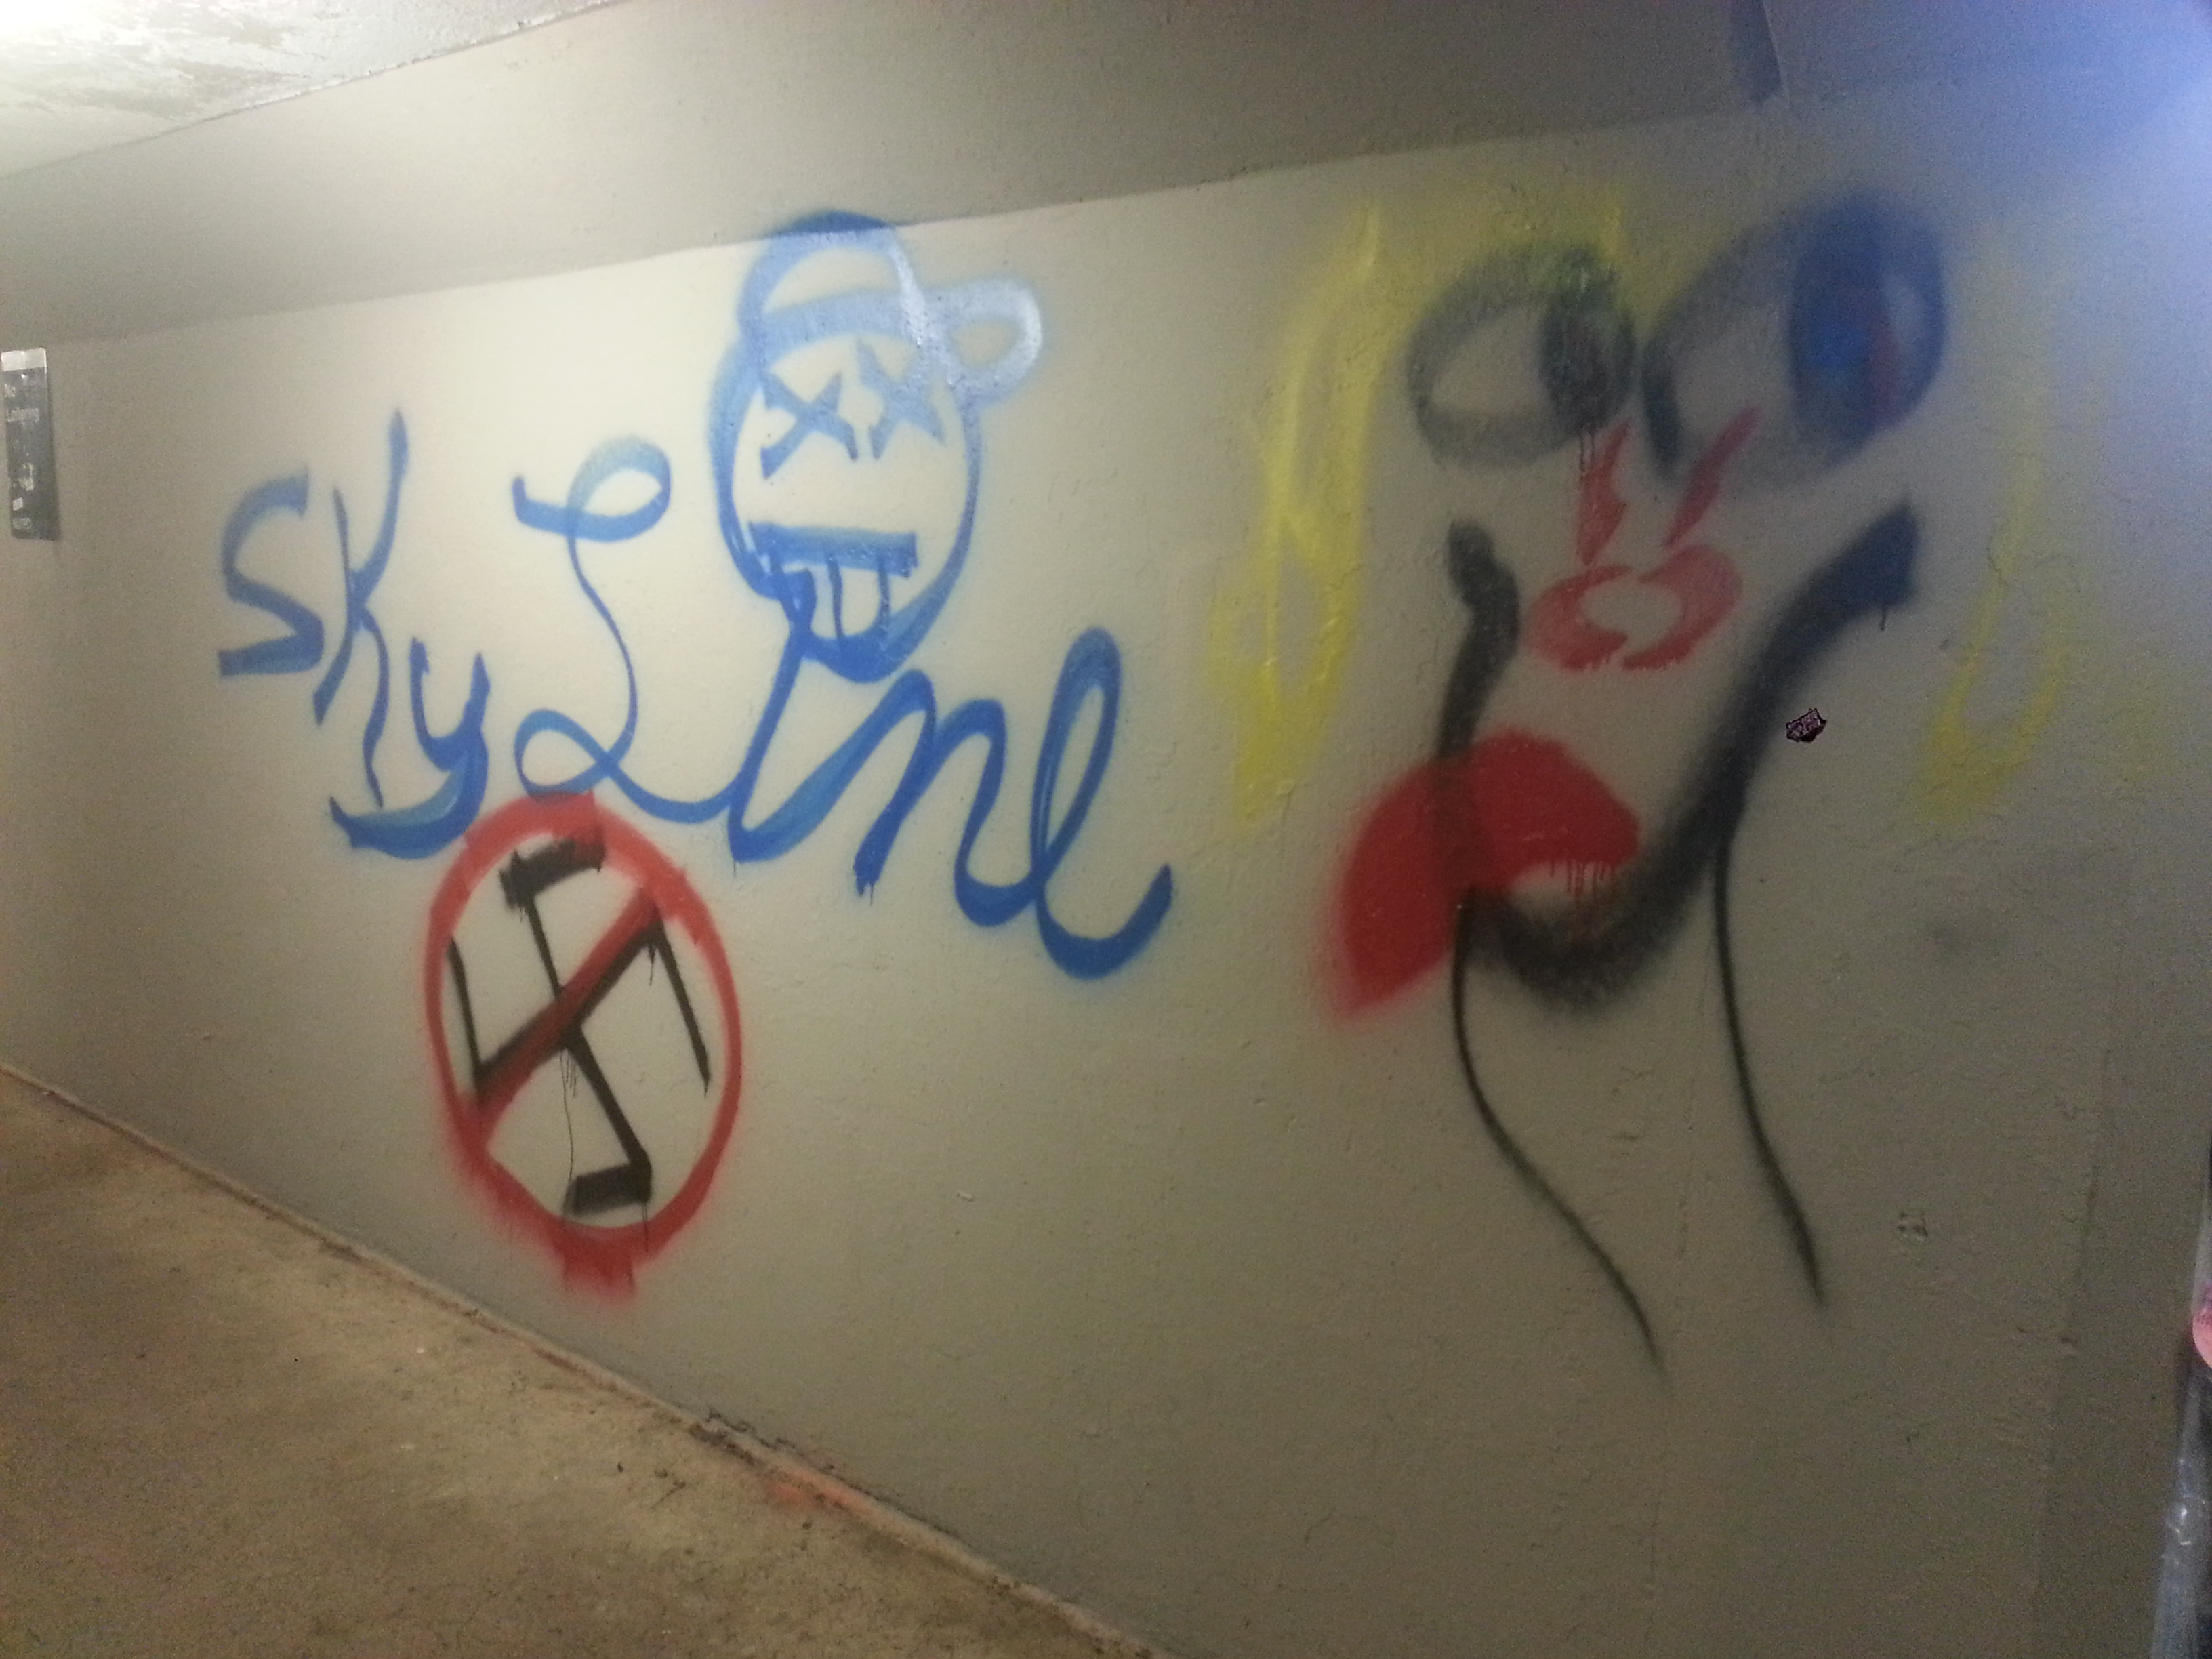 b0a09ac1fde4a89ea8d6_swastika3.jpg